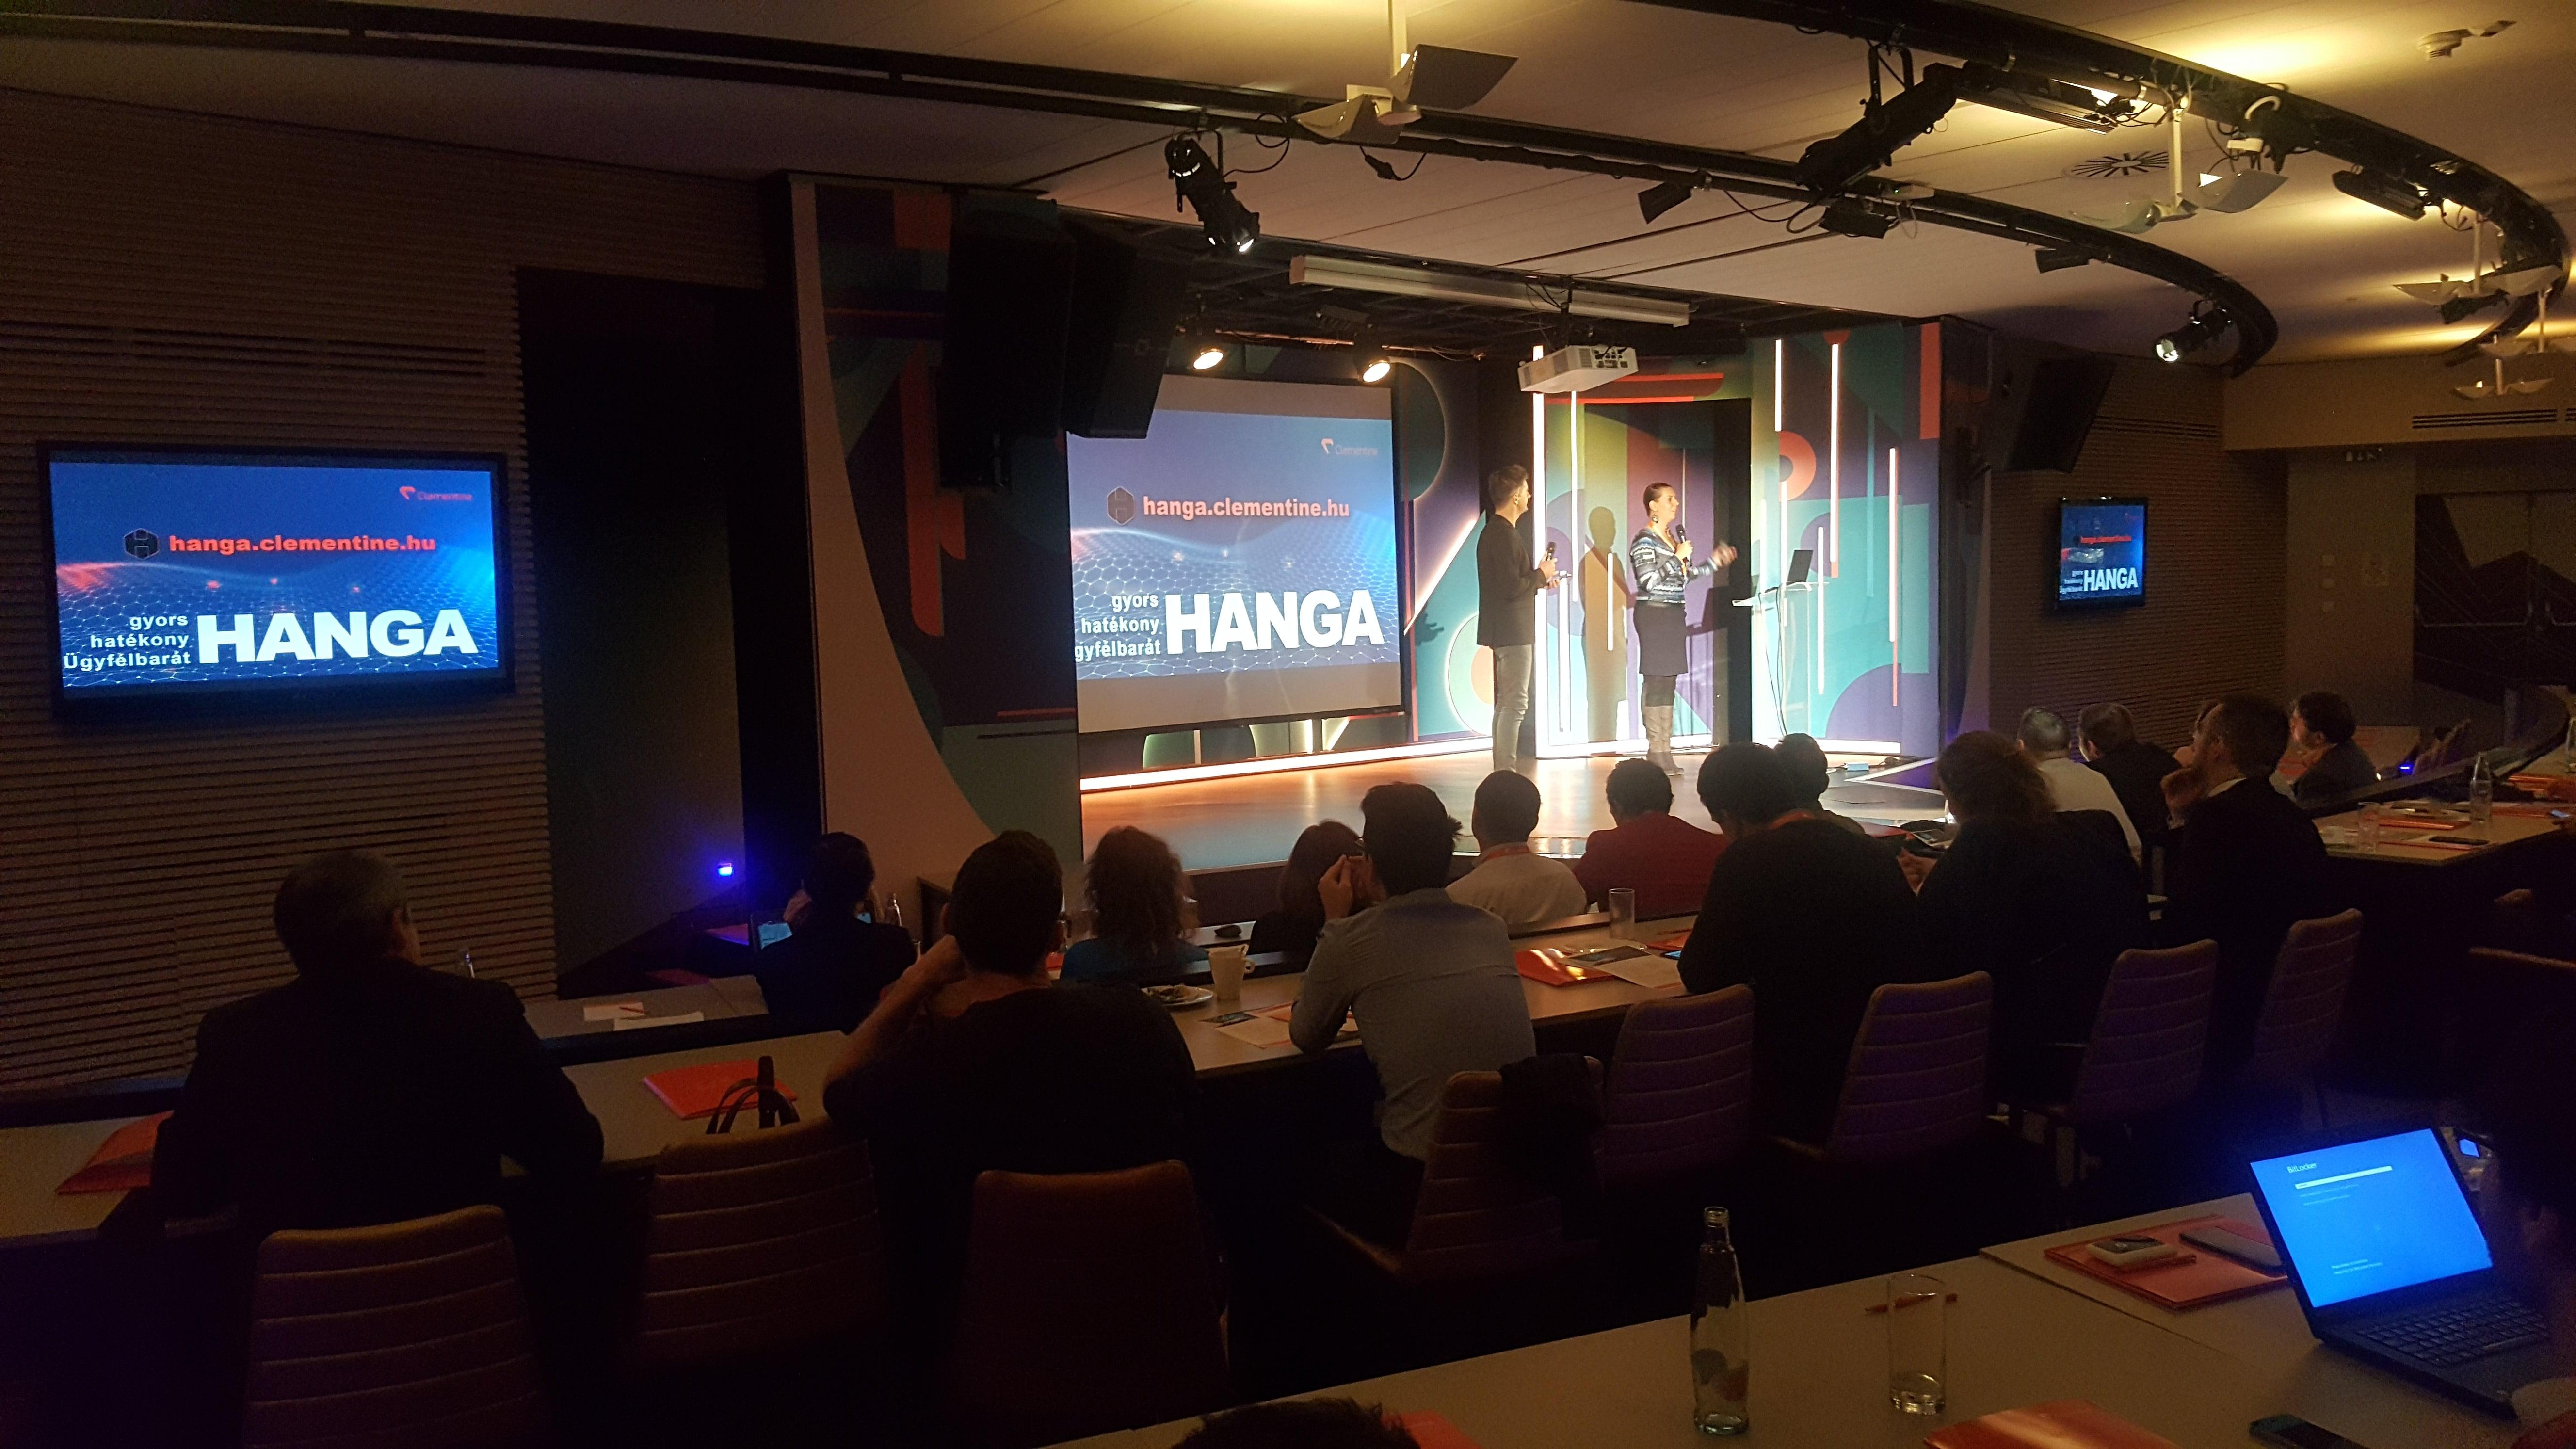 conTEXT 2018 Hanga